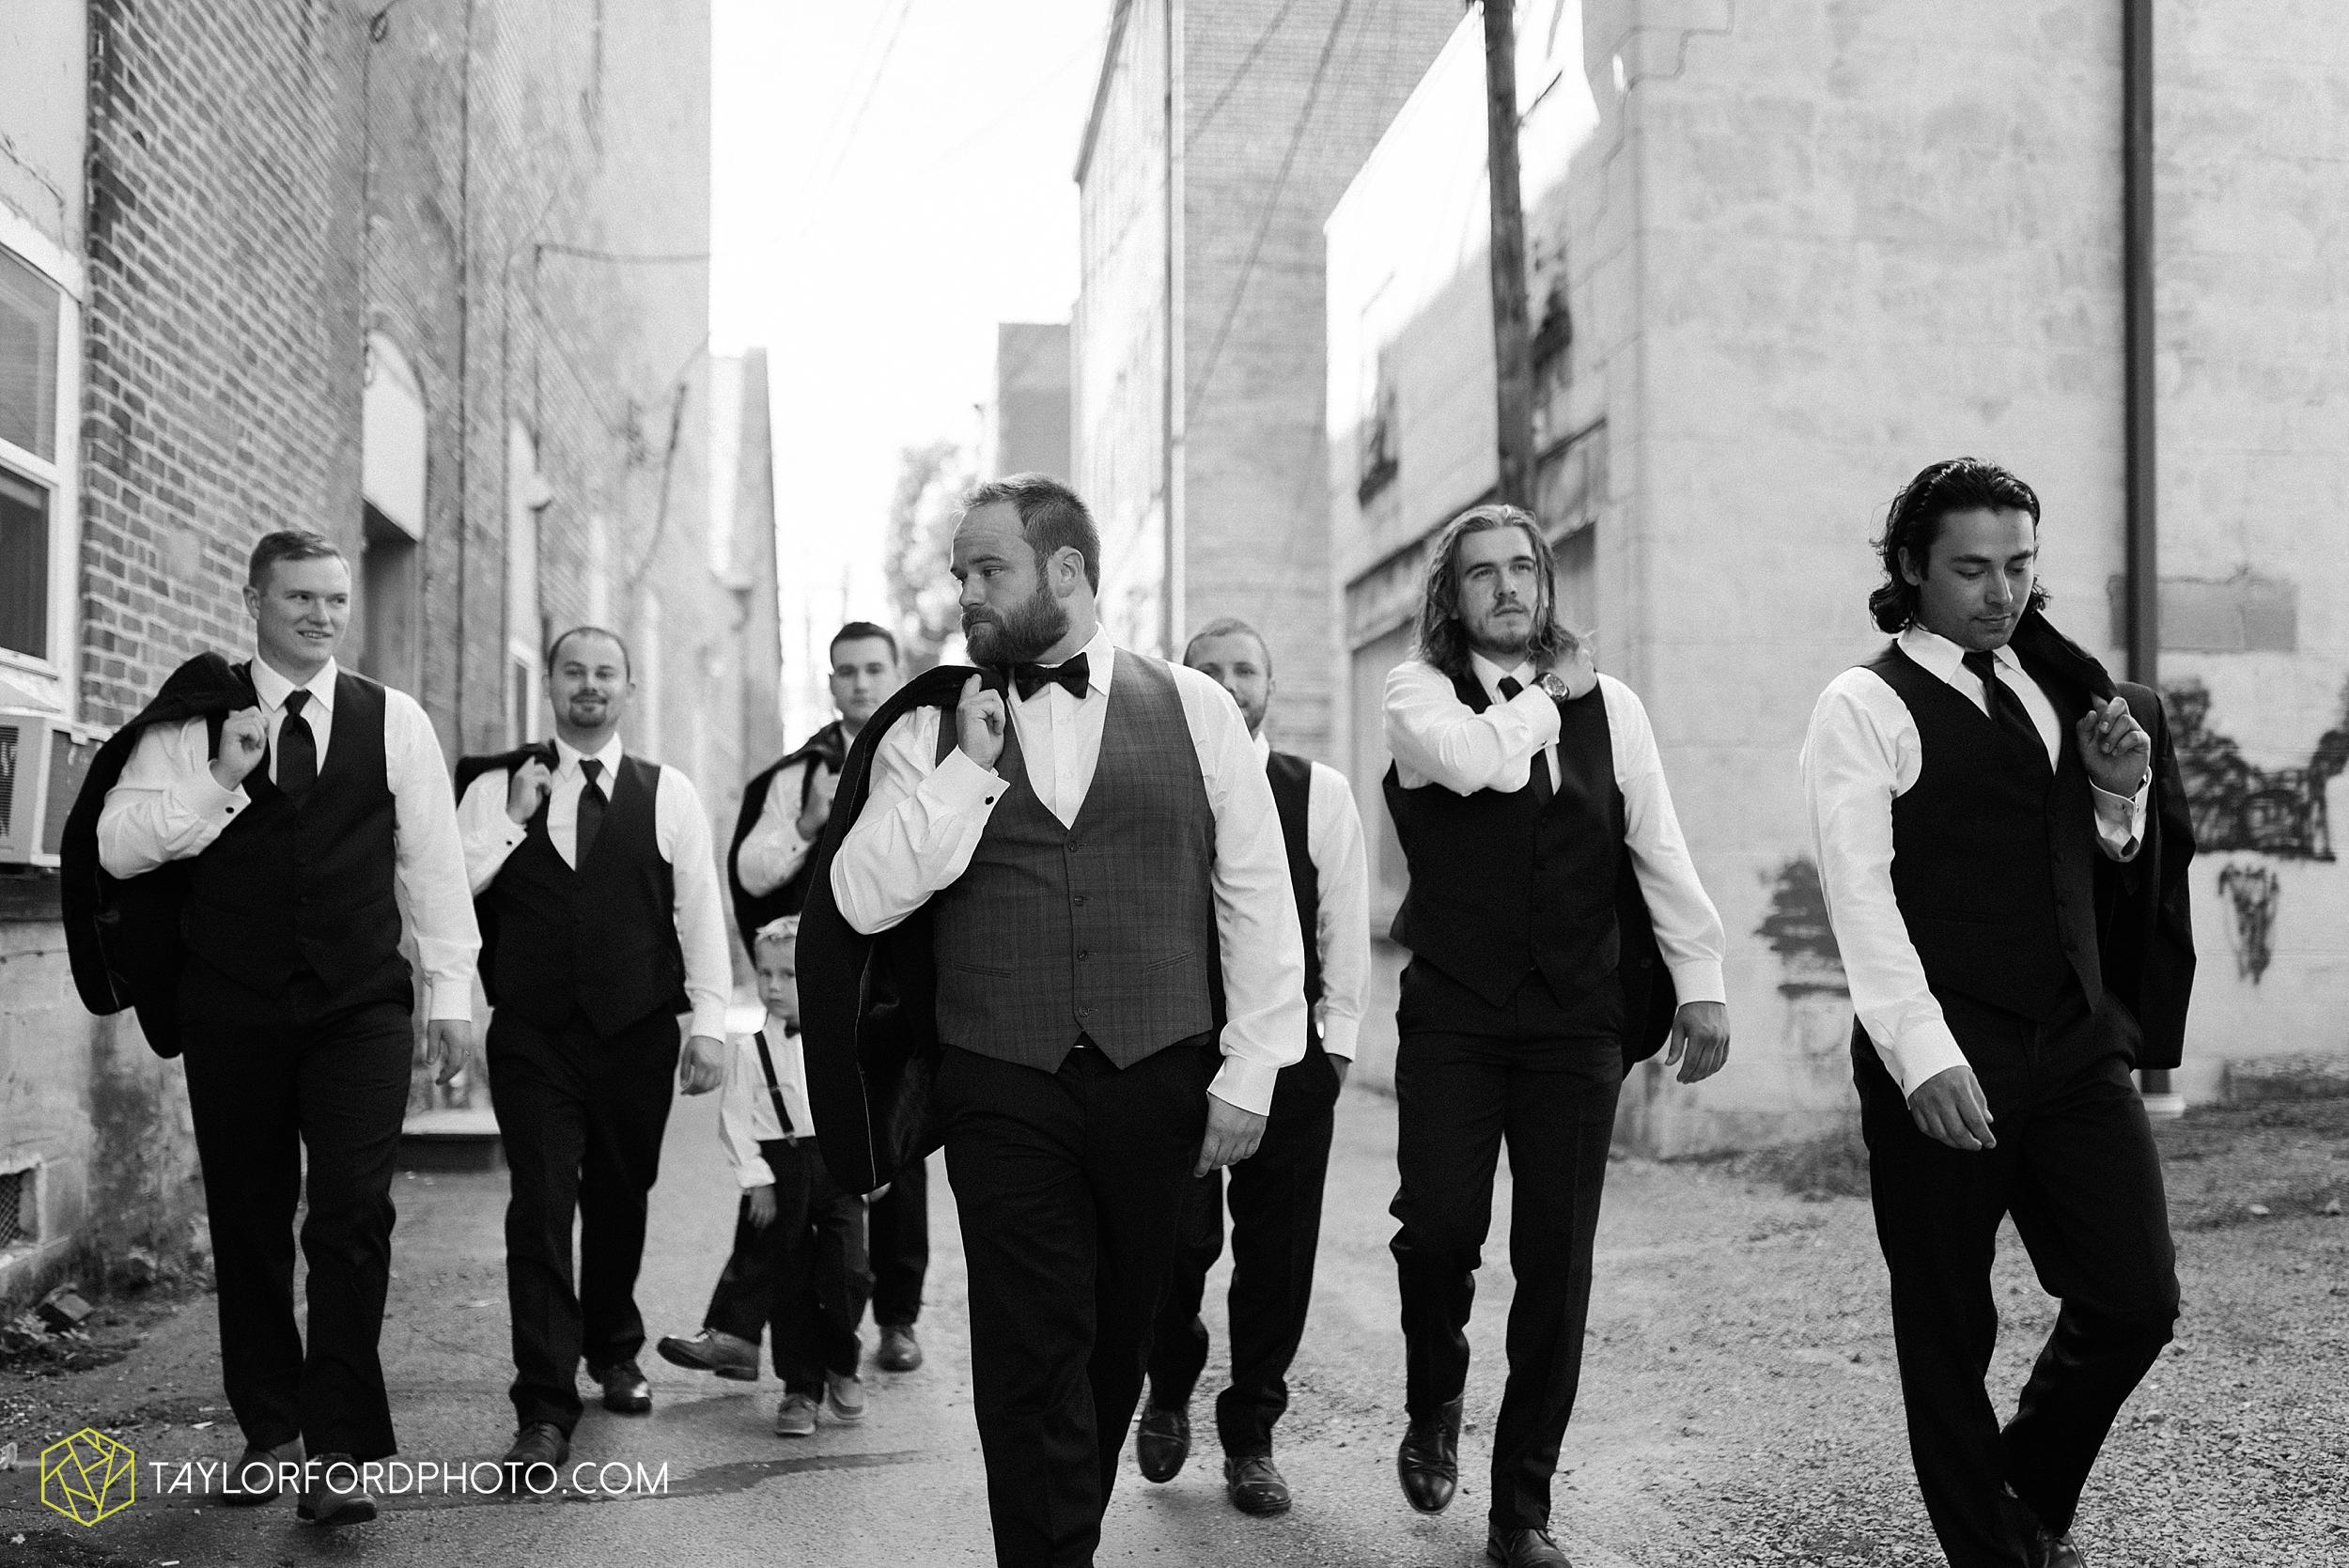 chelsey-zosh-jackson-young-first-united-methodist-church-senior-center-van-wert-ohio-wedding-photographer-taylor-ford-photography_0063.jpg